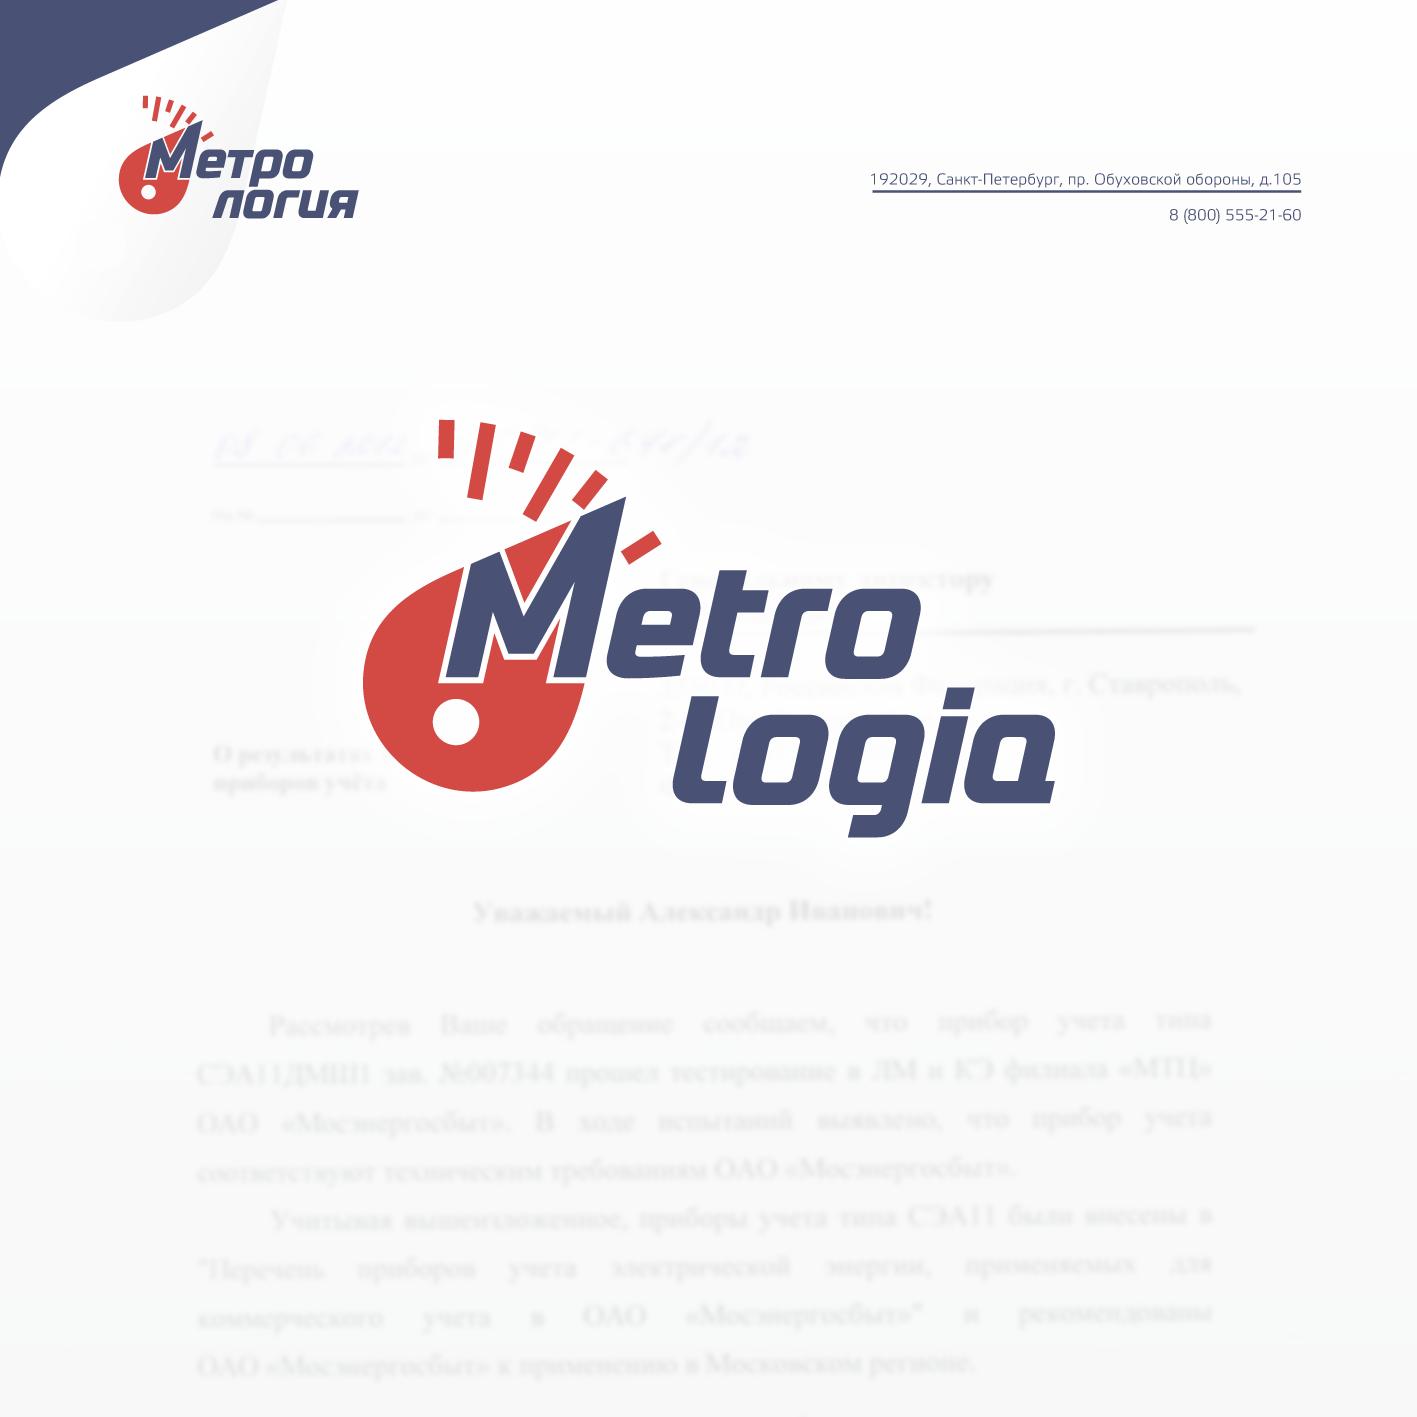 Разработать логотип, визитку, фирменный бланк. фото f_19558f4c14e59c99.png